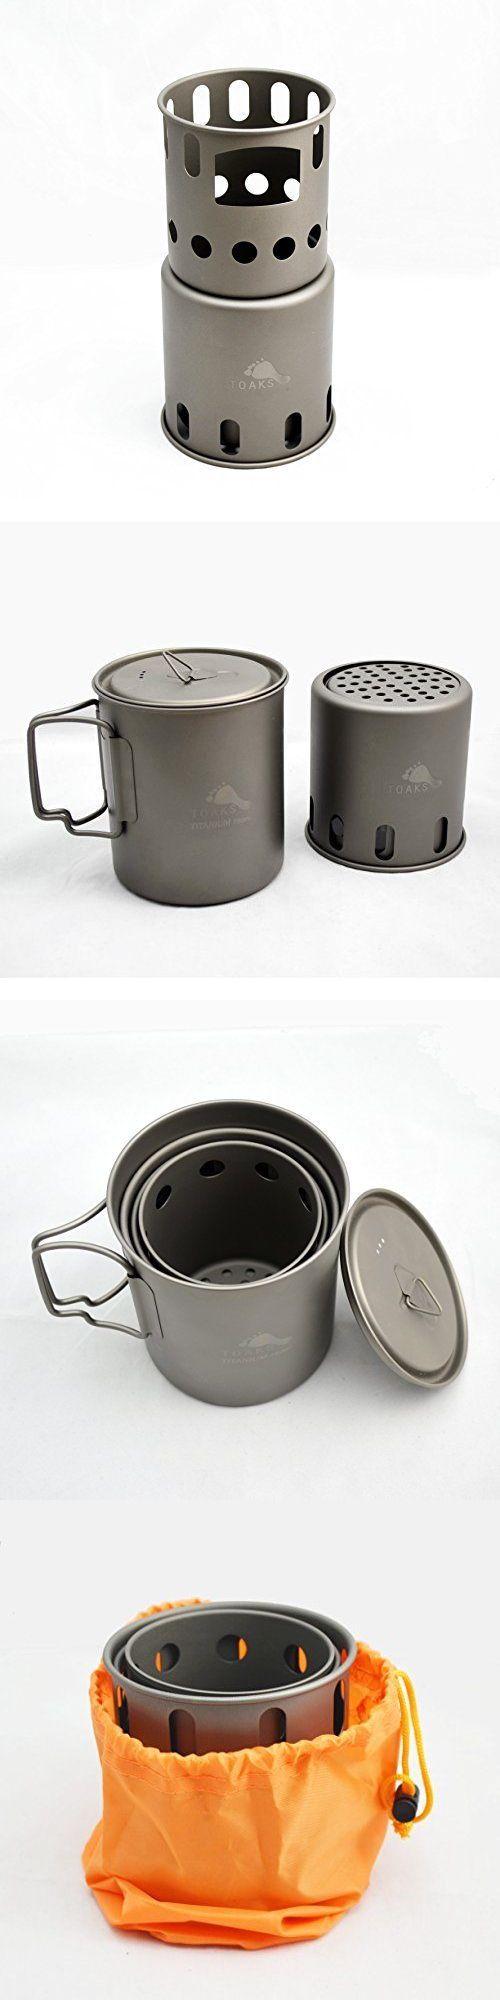 Best 25+ Wood stove parts ideas on Pinterest